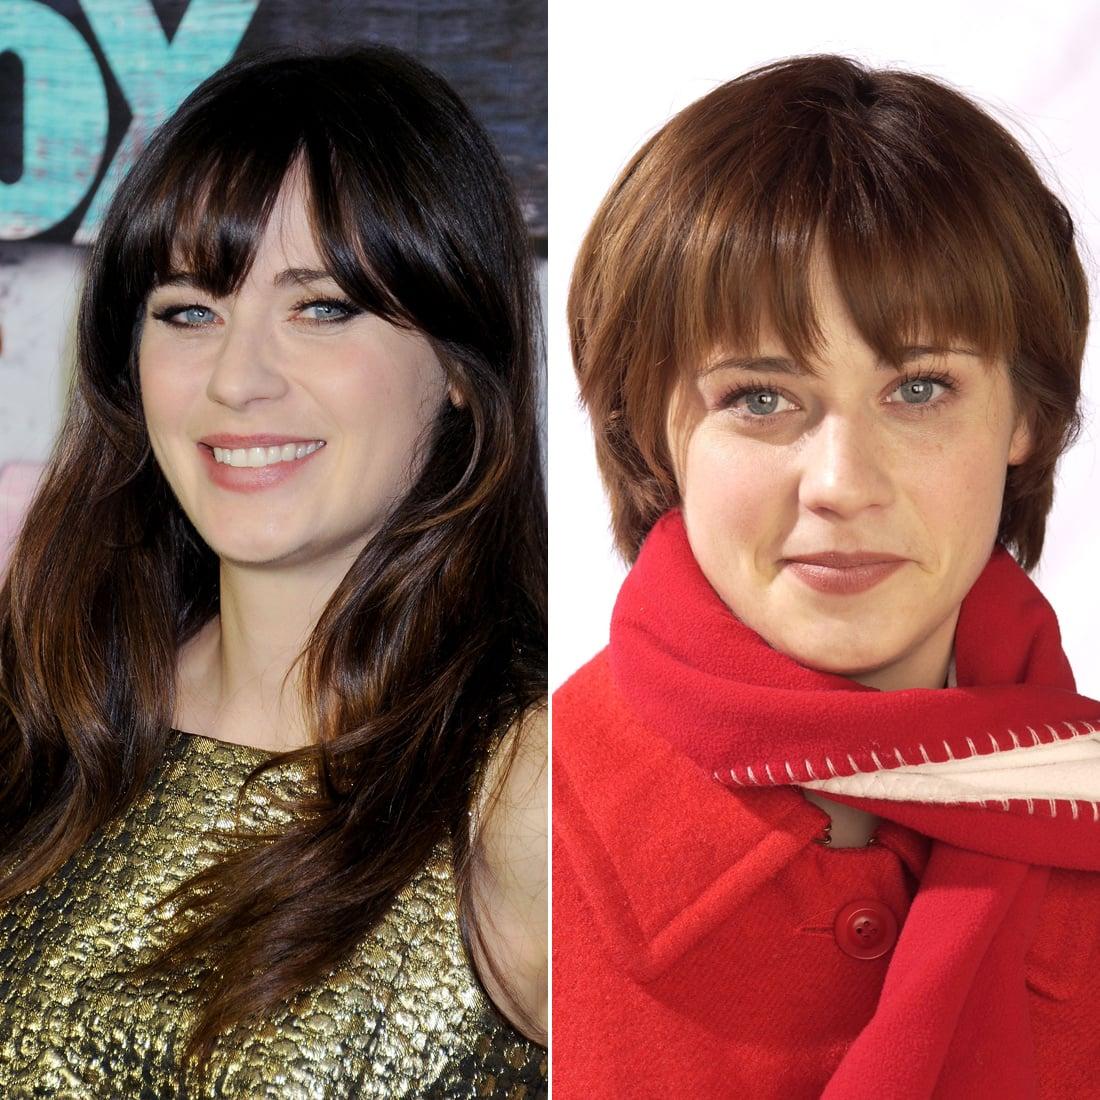 Zooey Deschanel Do These Celebrities Look Better With Long Or Short Hair Popsugar Beauty Photo 5